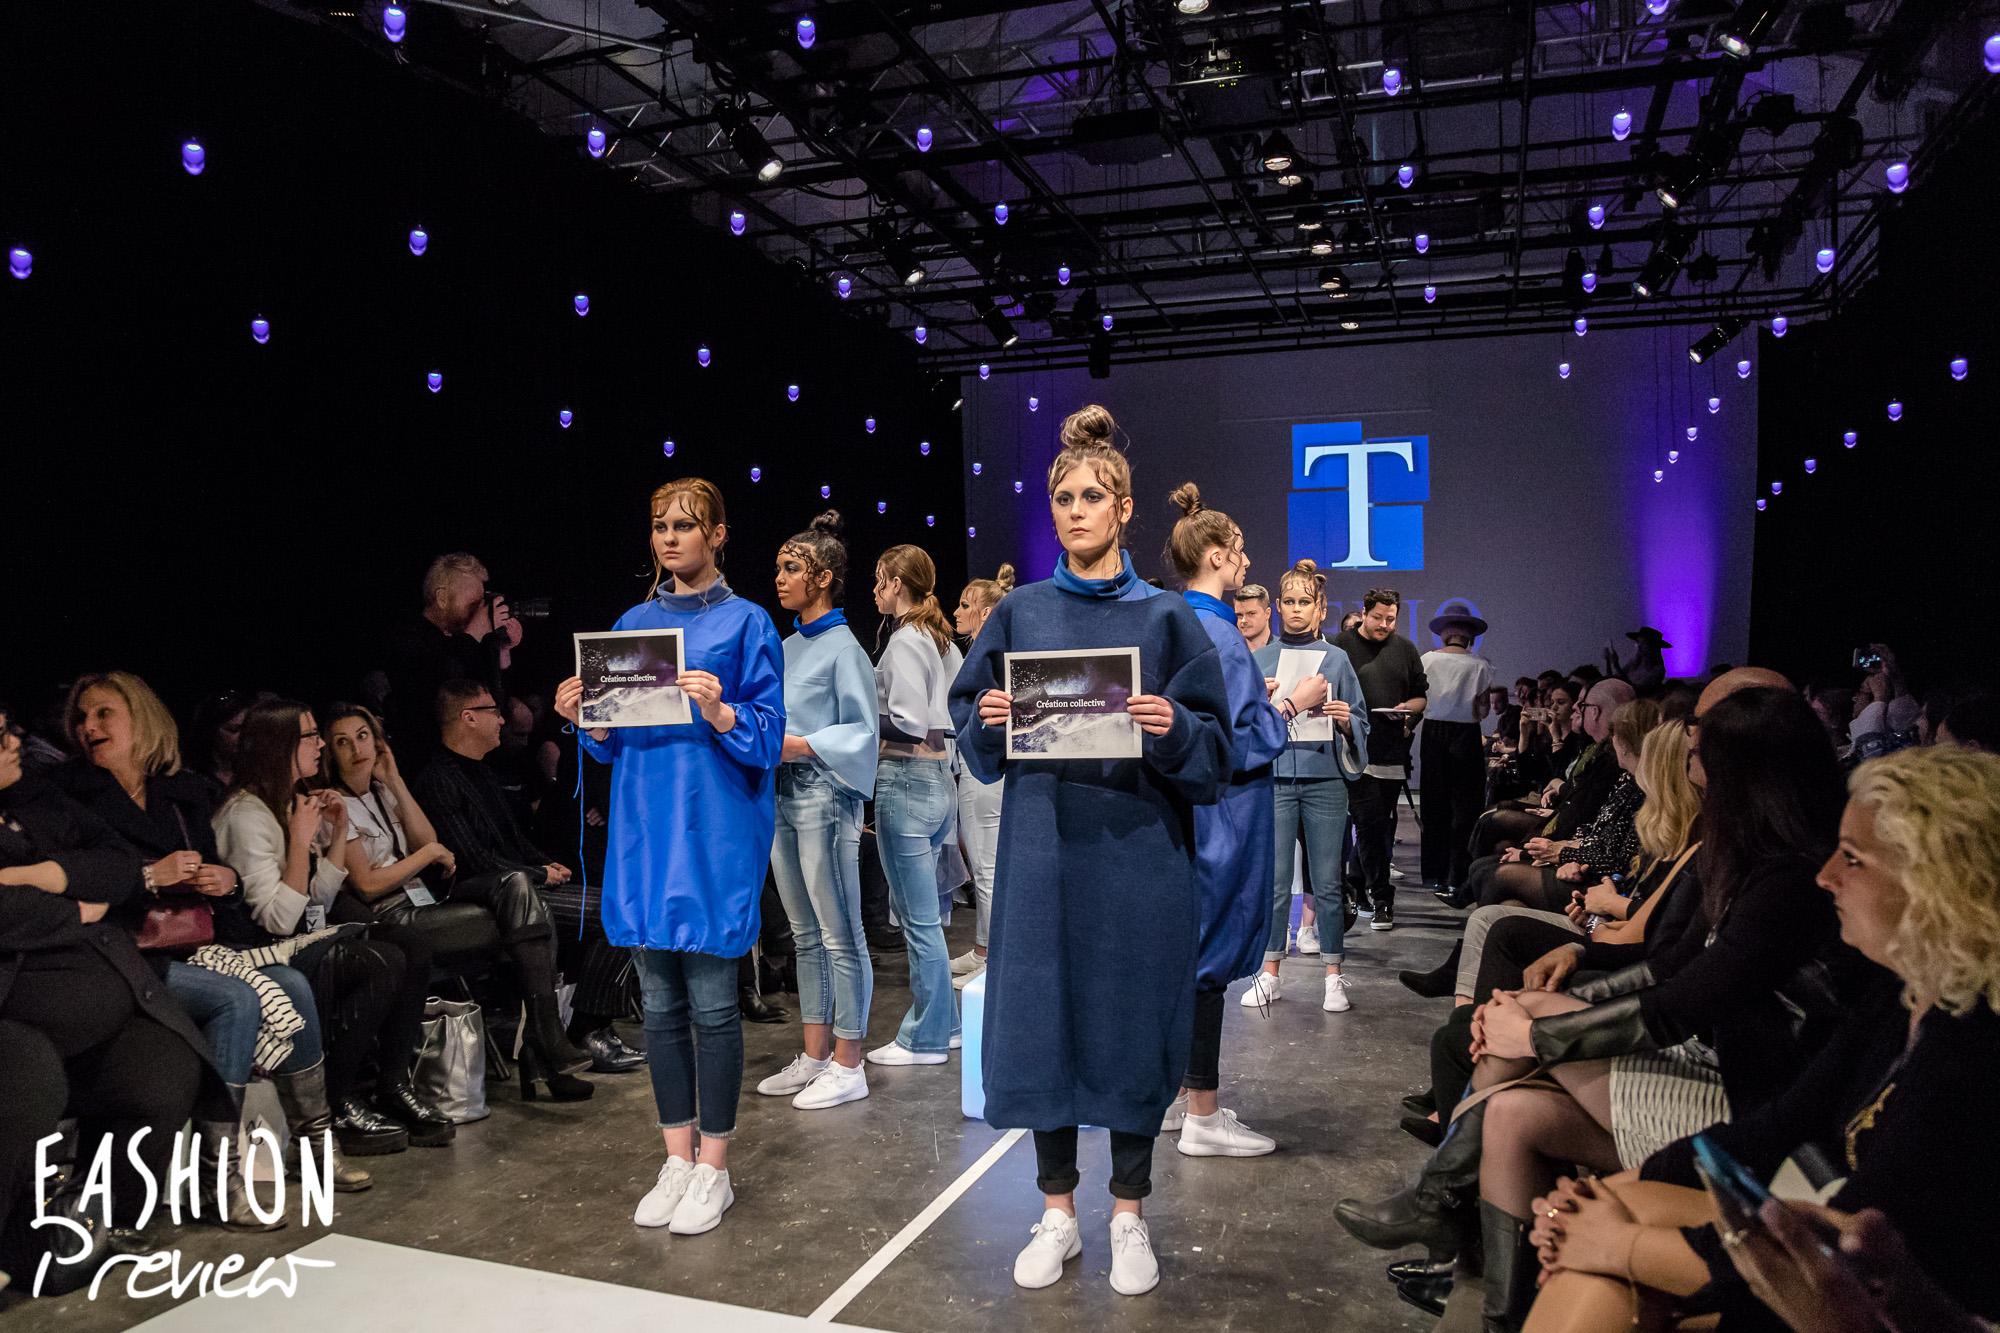 Fashion Preview 9 - Cegep Marie Victorin-29.jpg